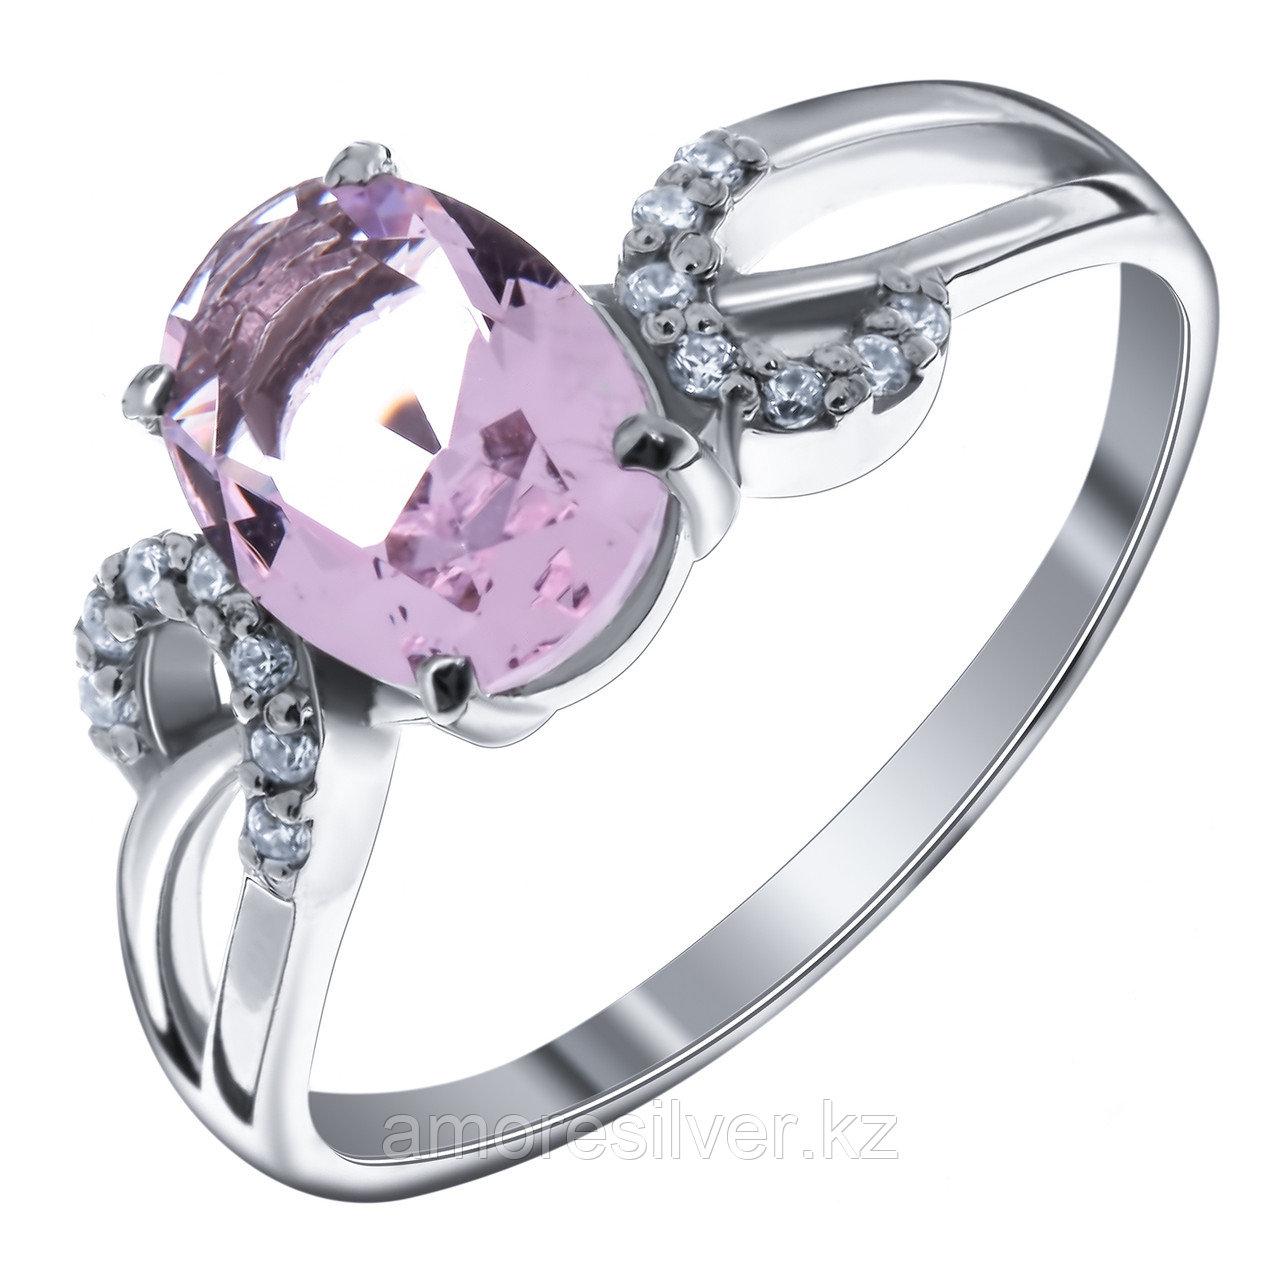 "Кольцо Teosa серебро с родием, фианит, ""halo"" 1-31-Р-ТМ"